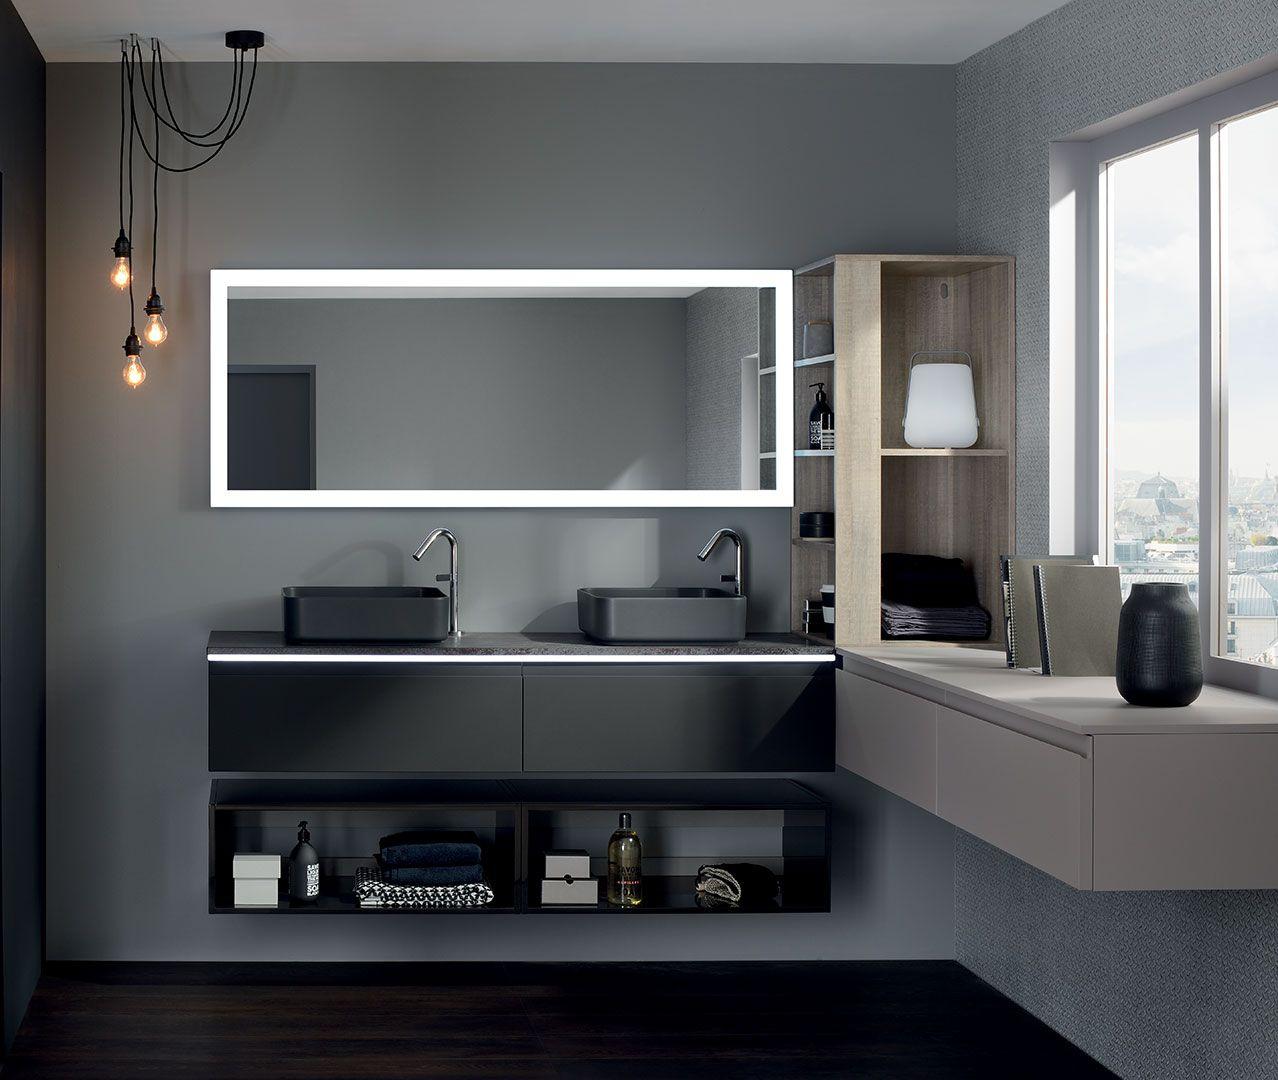 Meuble Salle De Bain Aquarine Newport ~ gamme halo meuble salle de bain design sanijura salle de bain